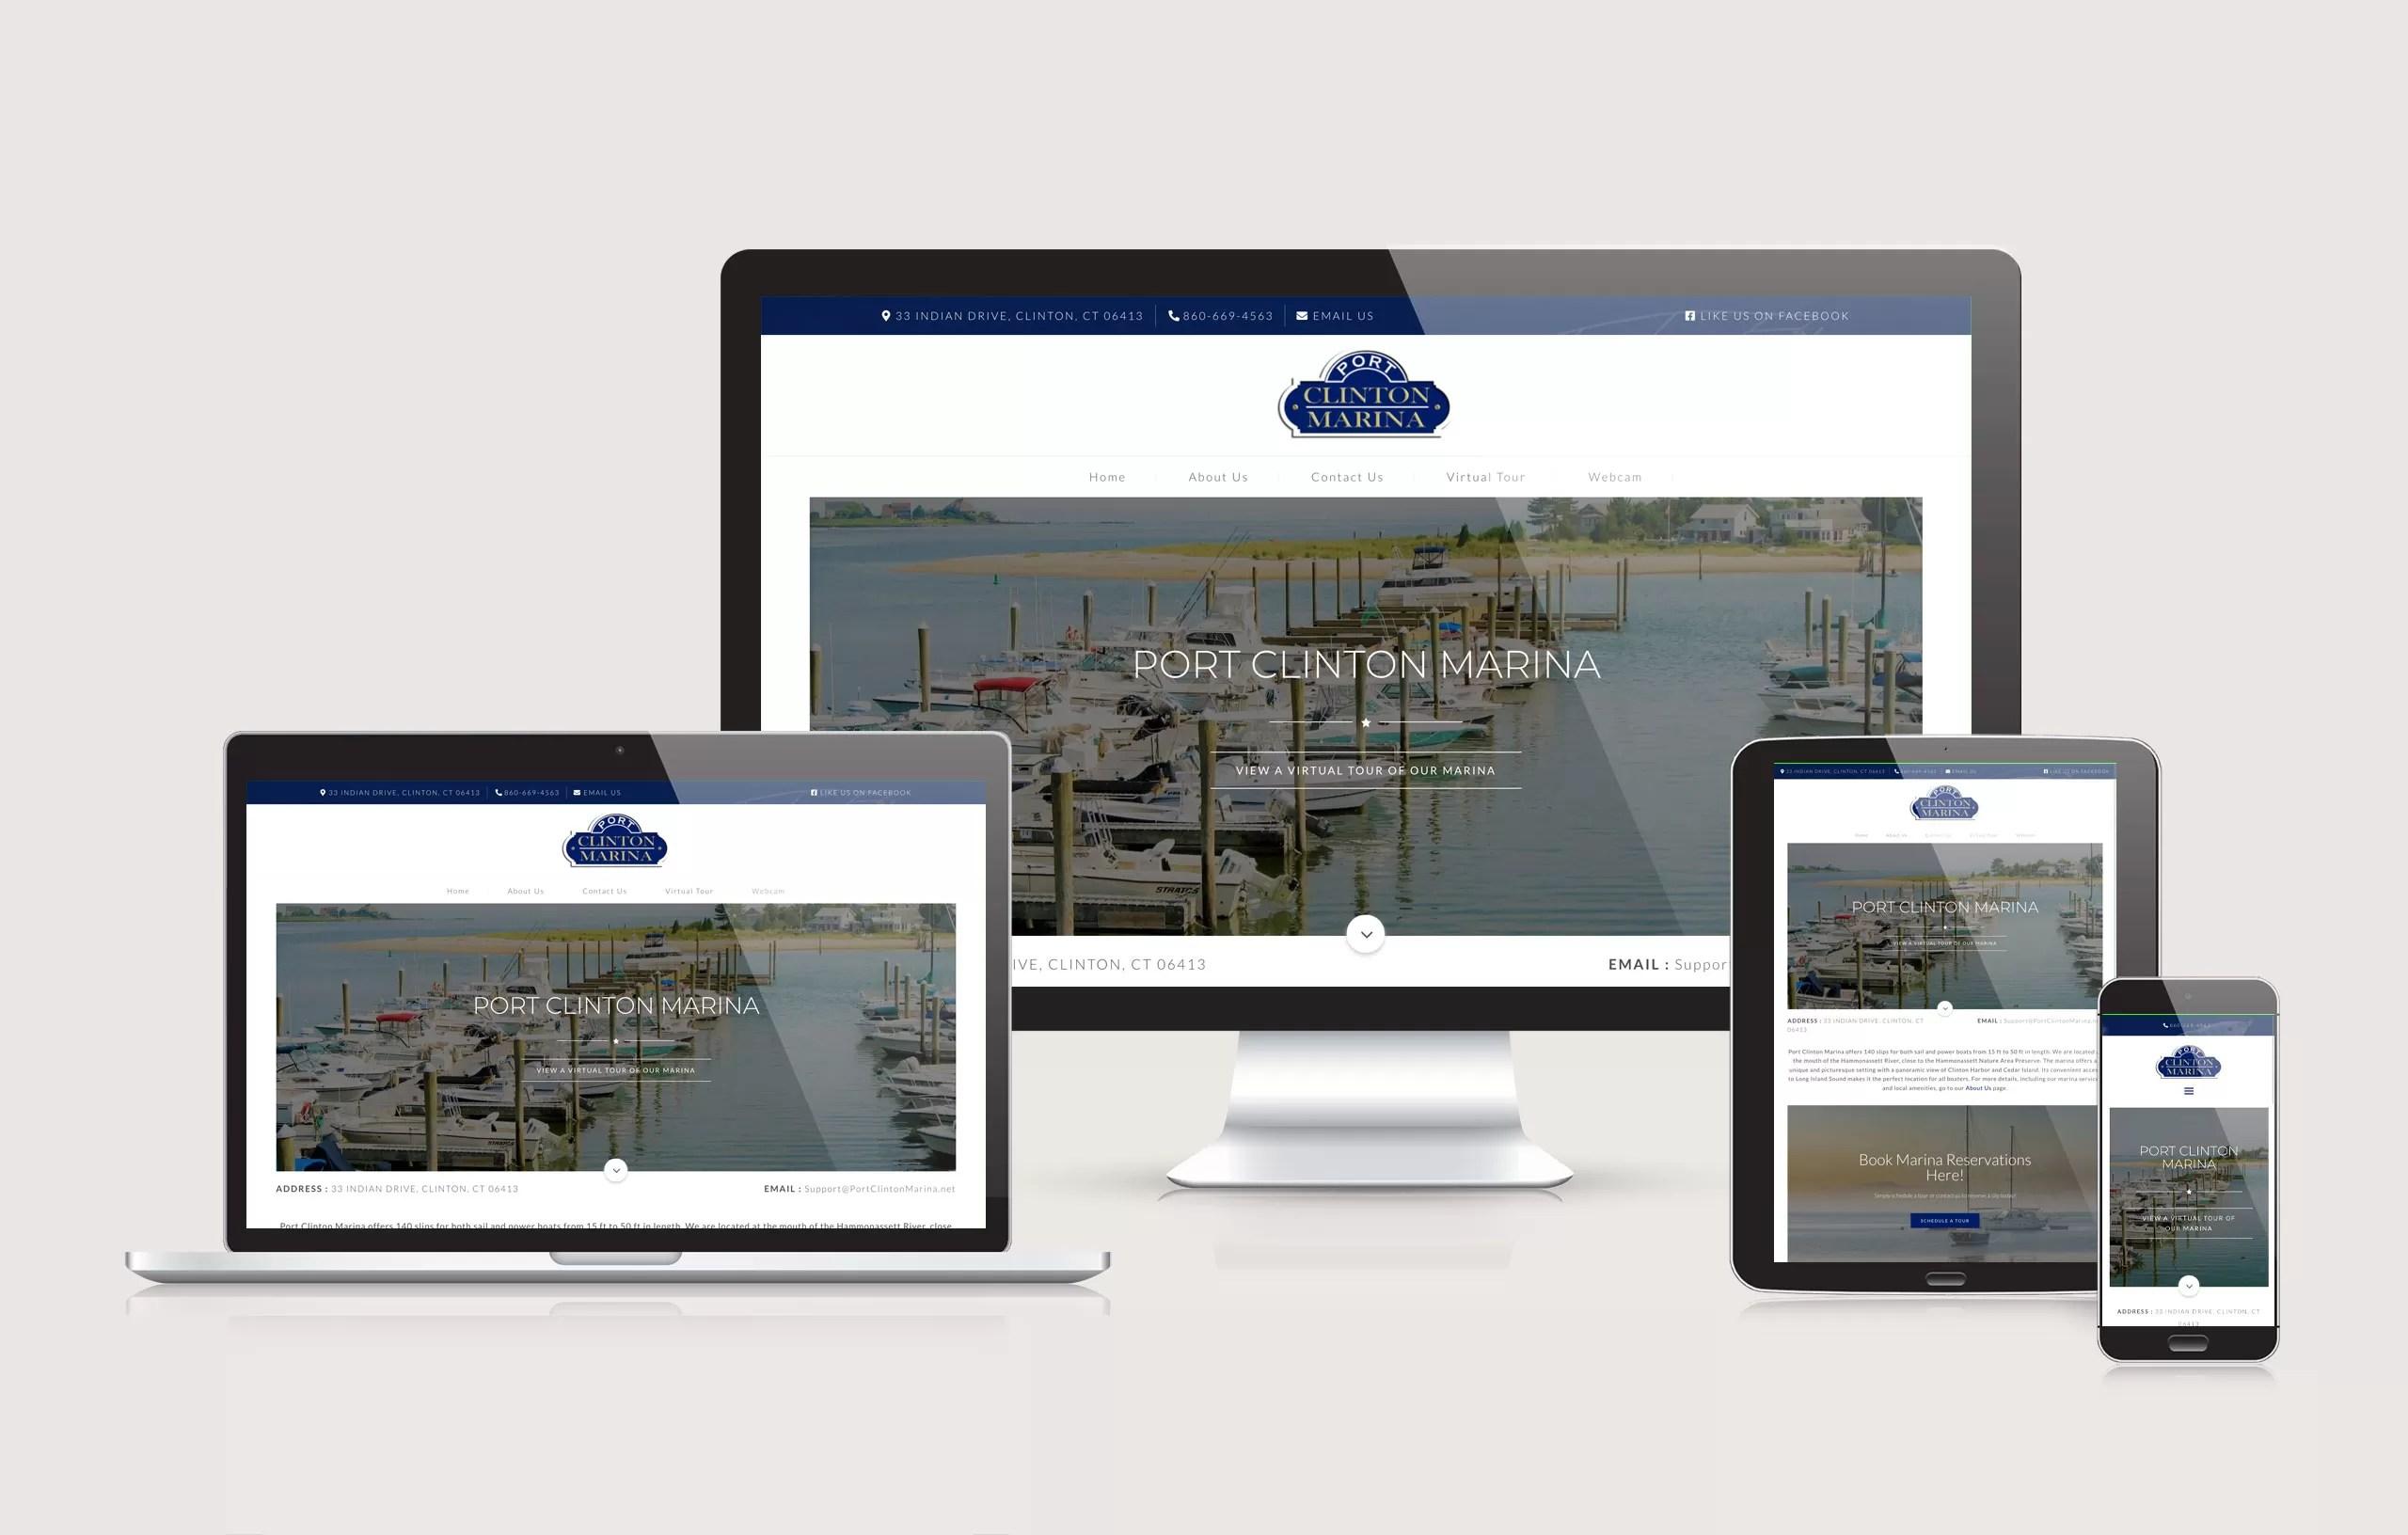 Port Clinton Marina - Website Layout Design by Ok Omni